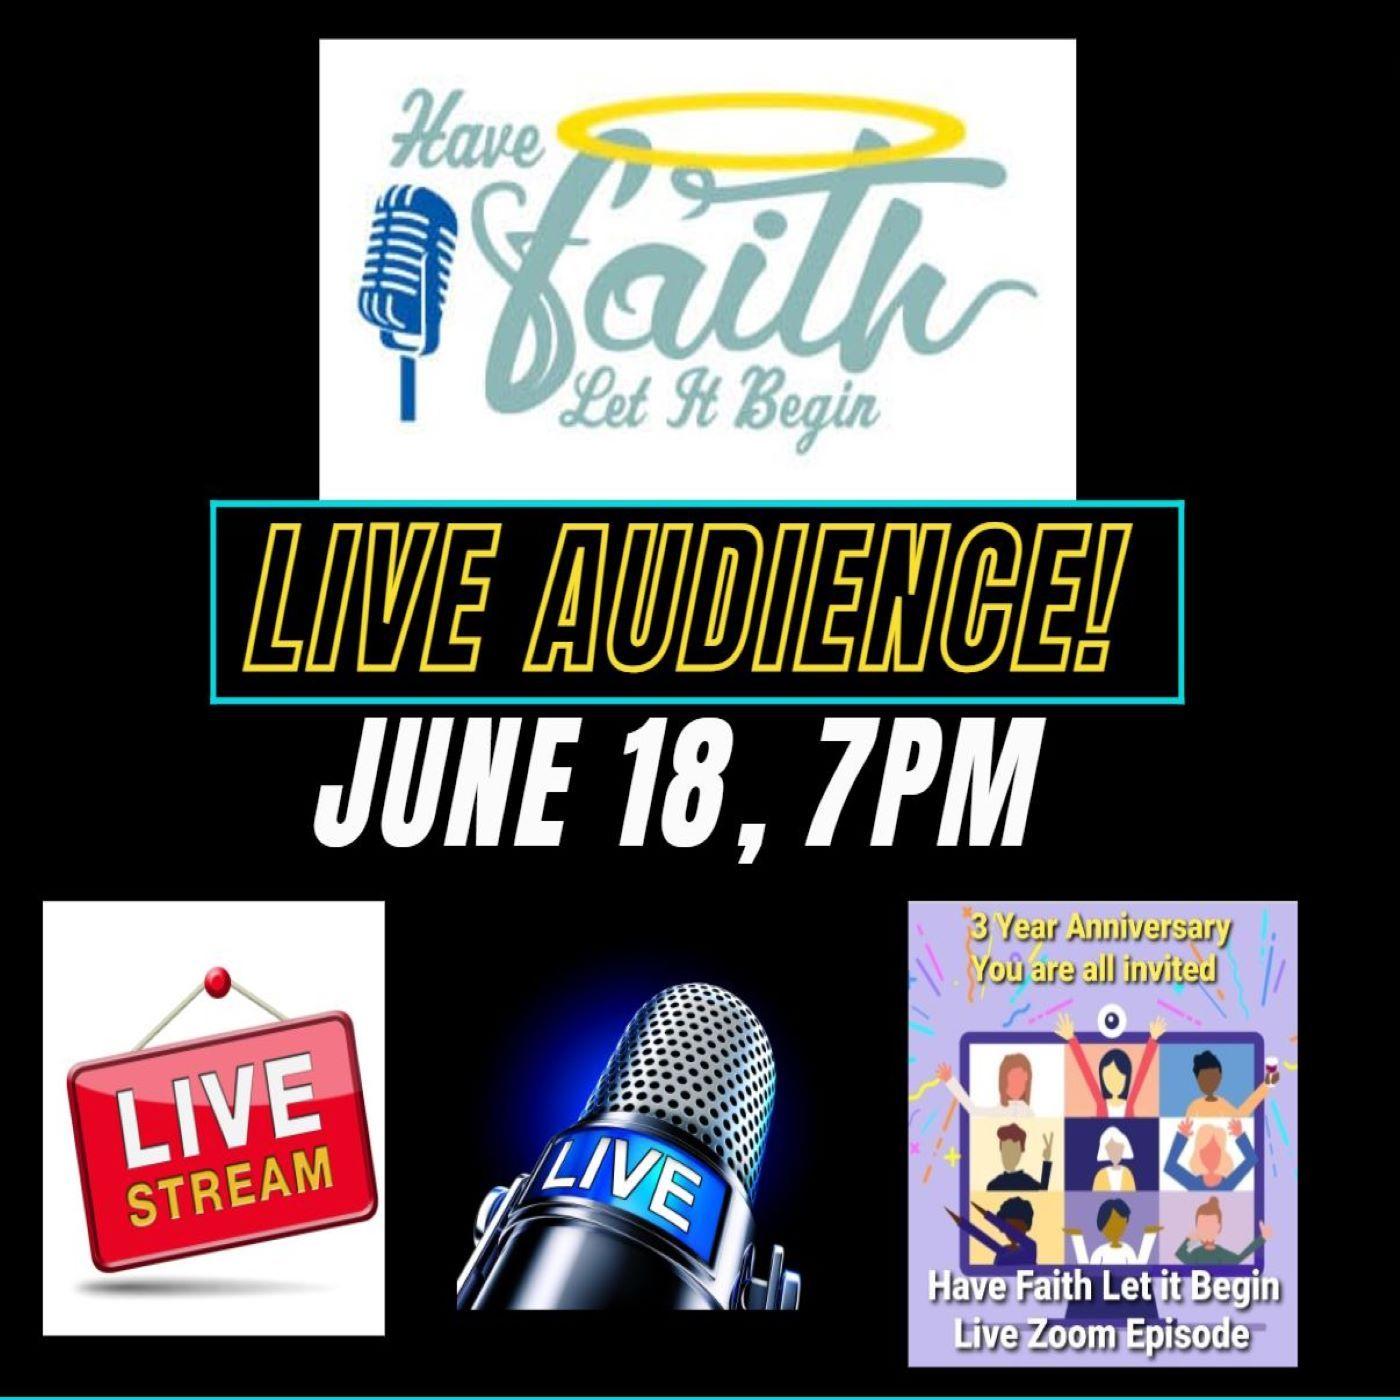 Have Faith Live 4 Year celebration June 18th